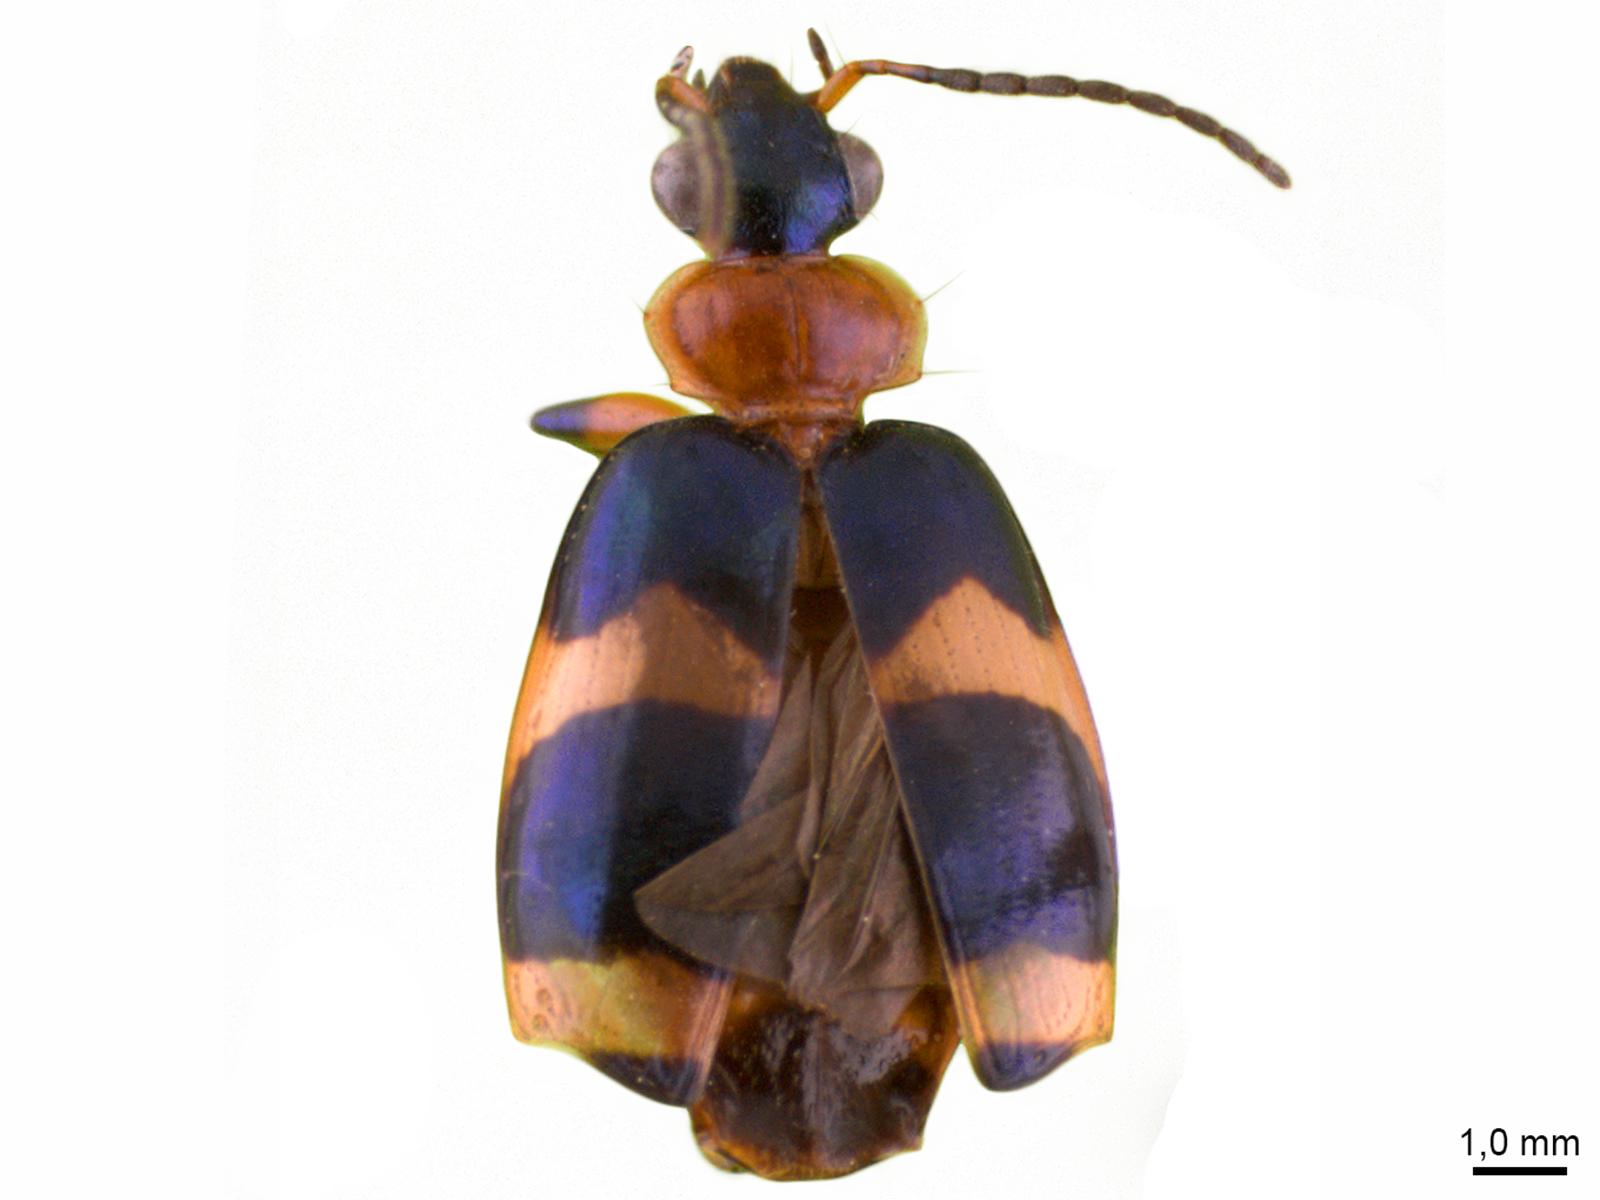 Lebia spp.